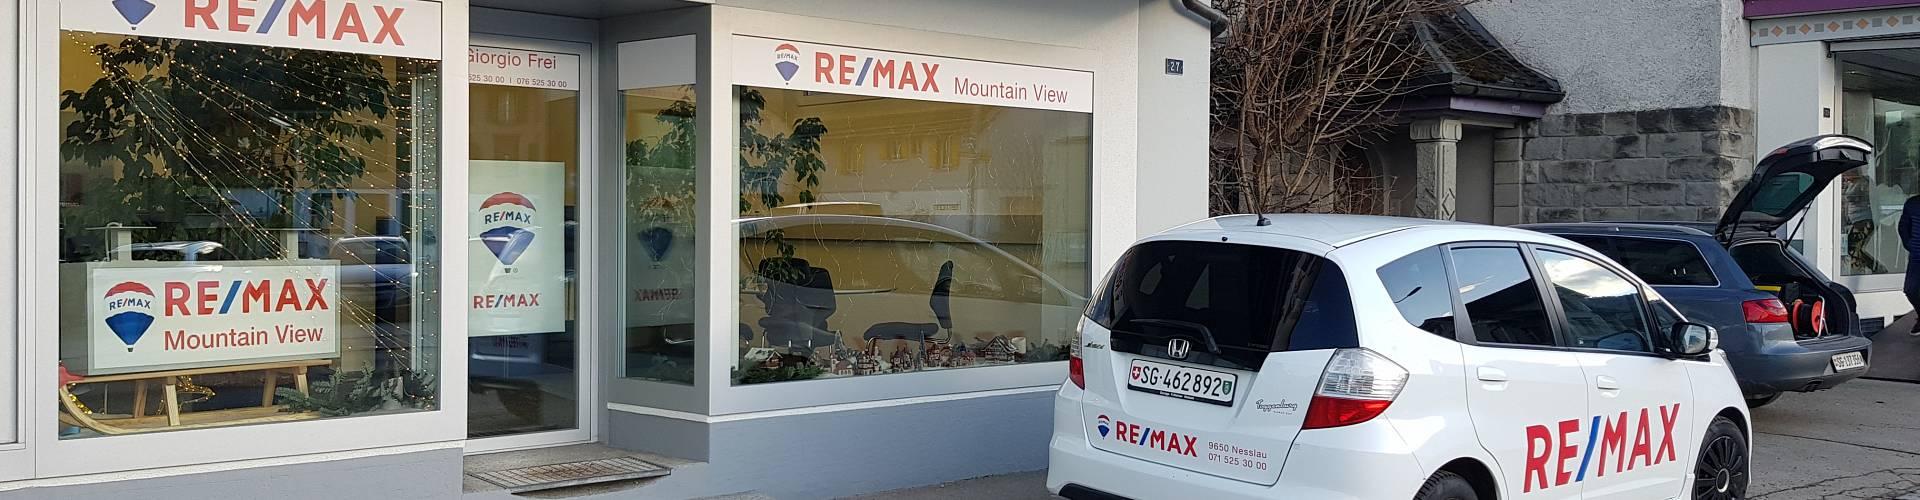 RE/MAX Mountain View